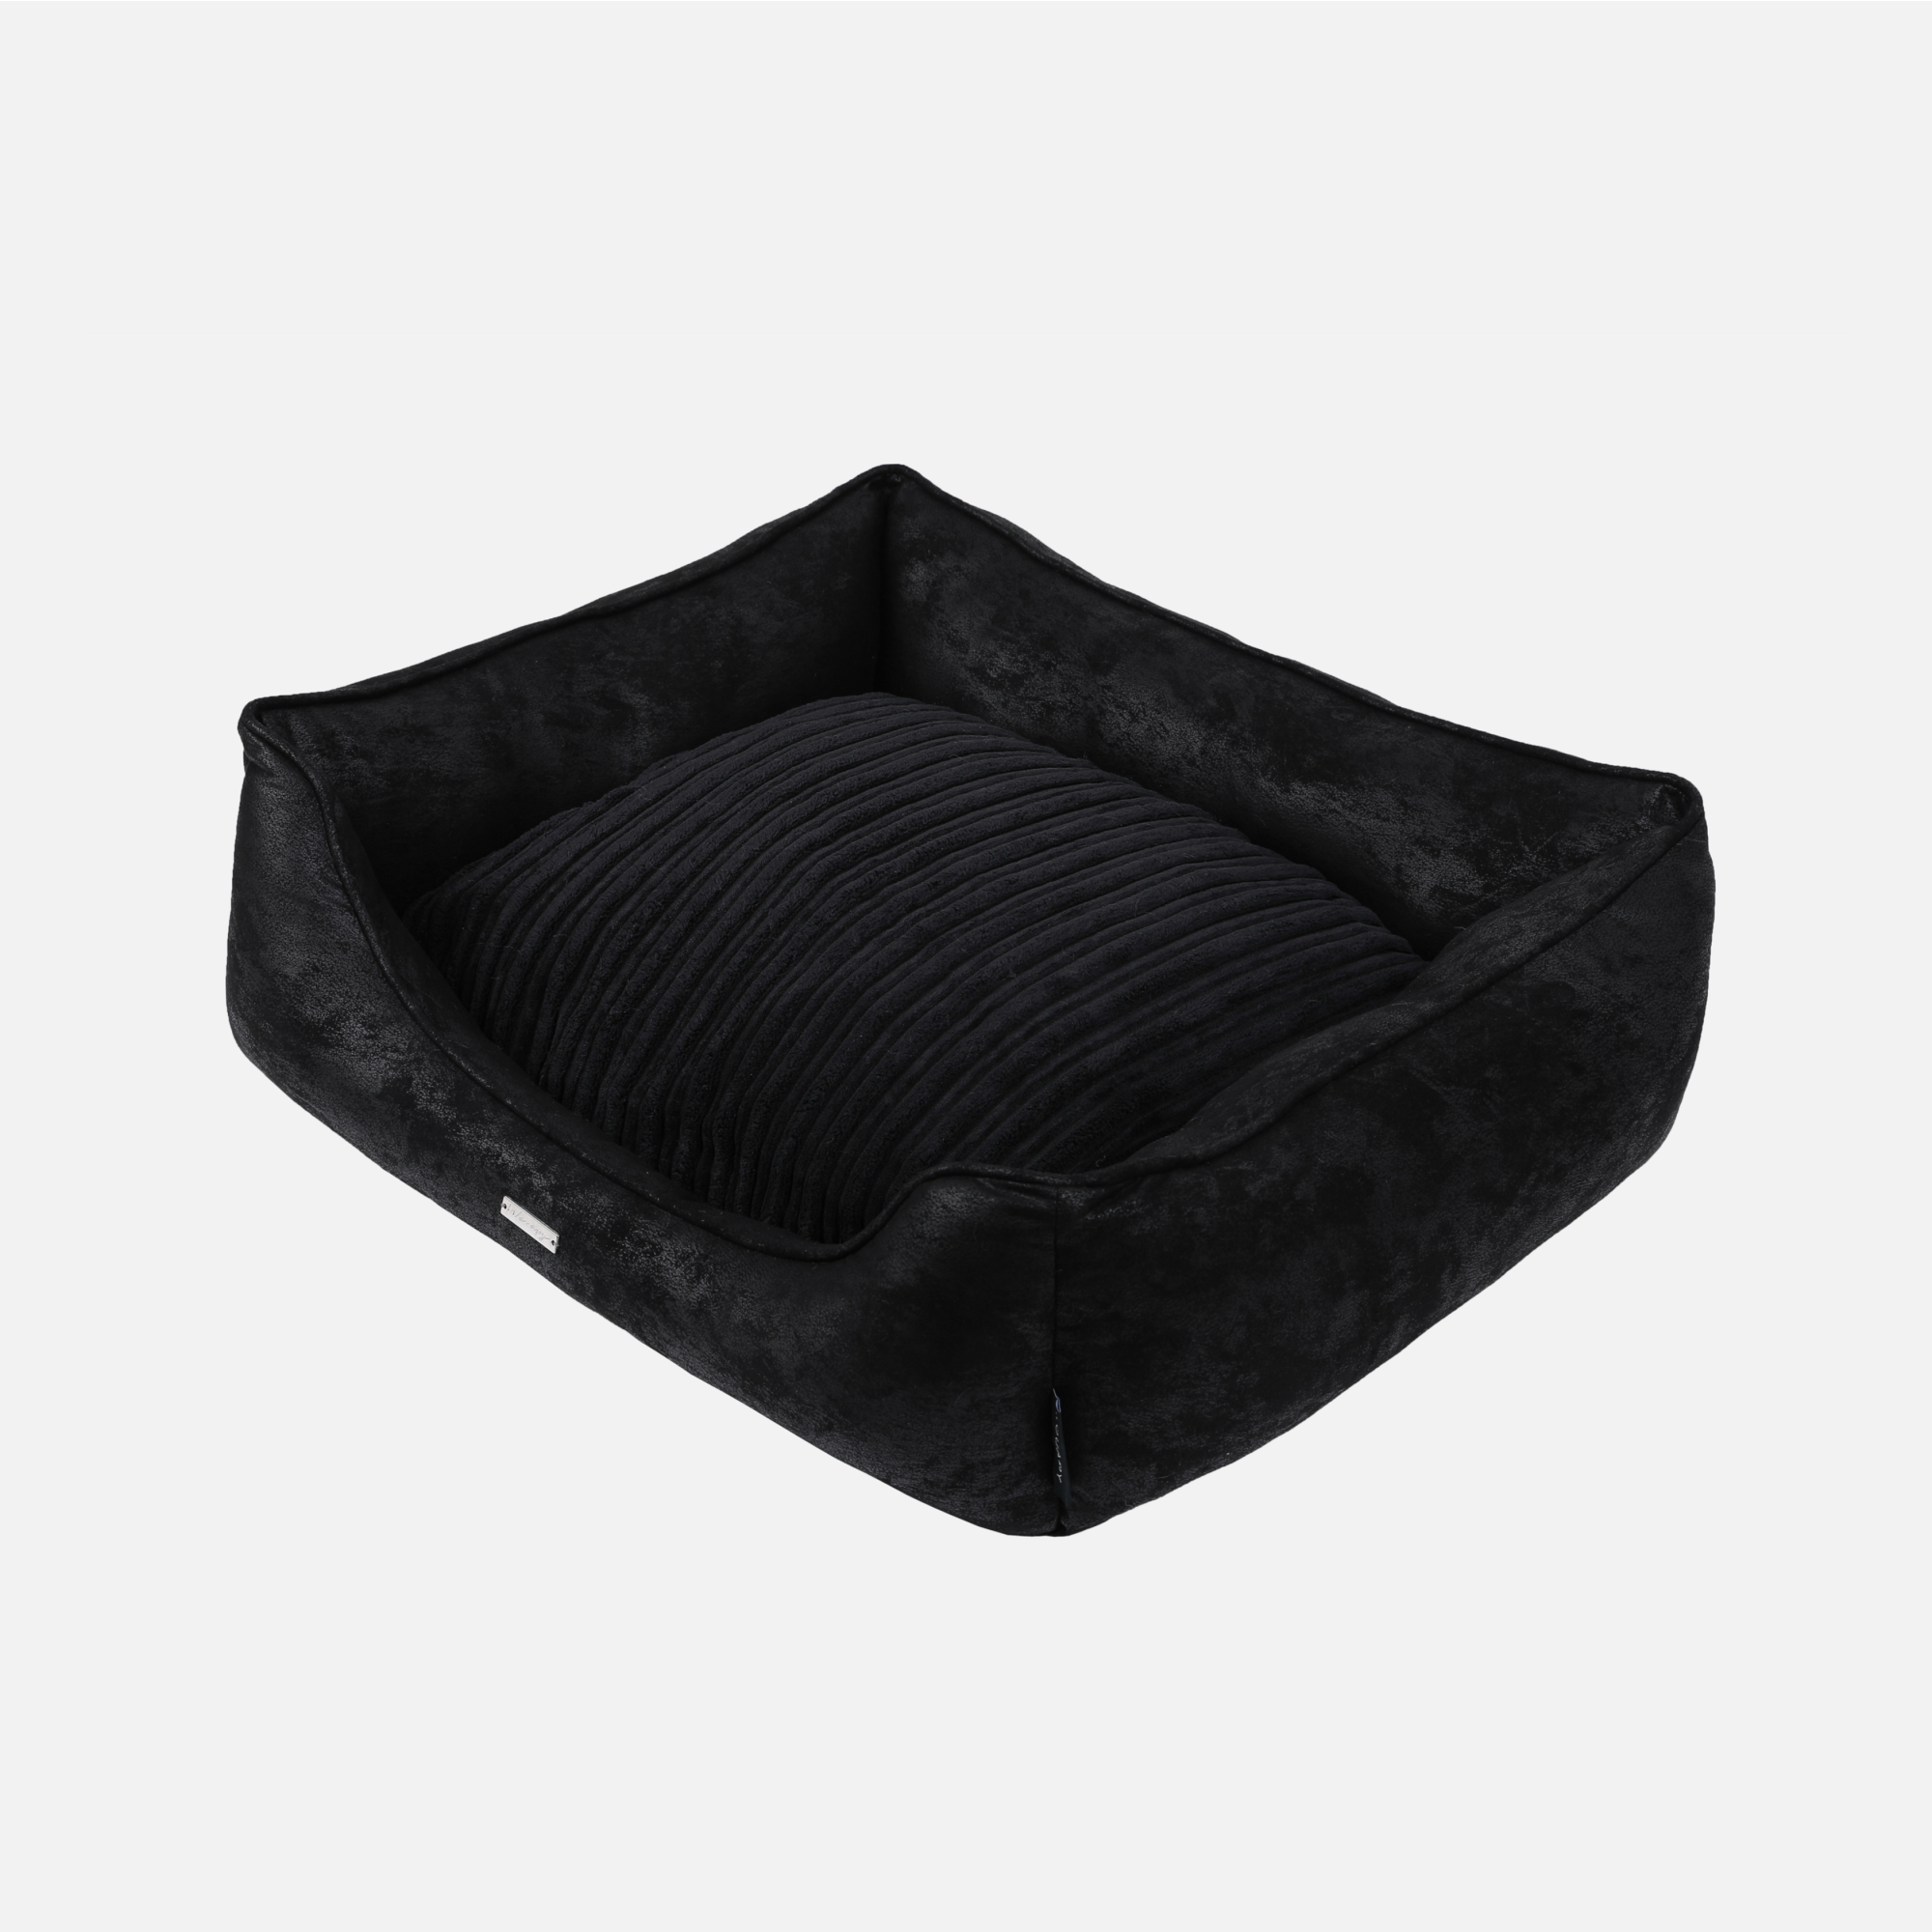 Sofa Deluxe Majestic par Wouapy